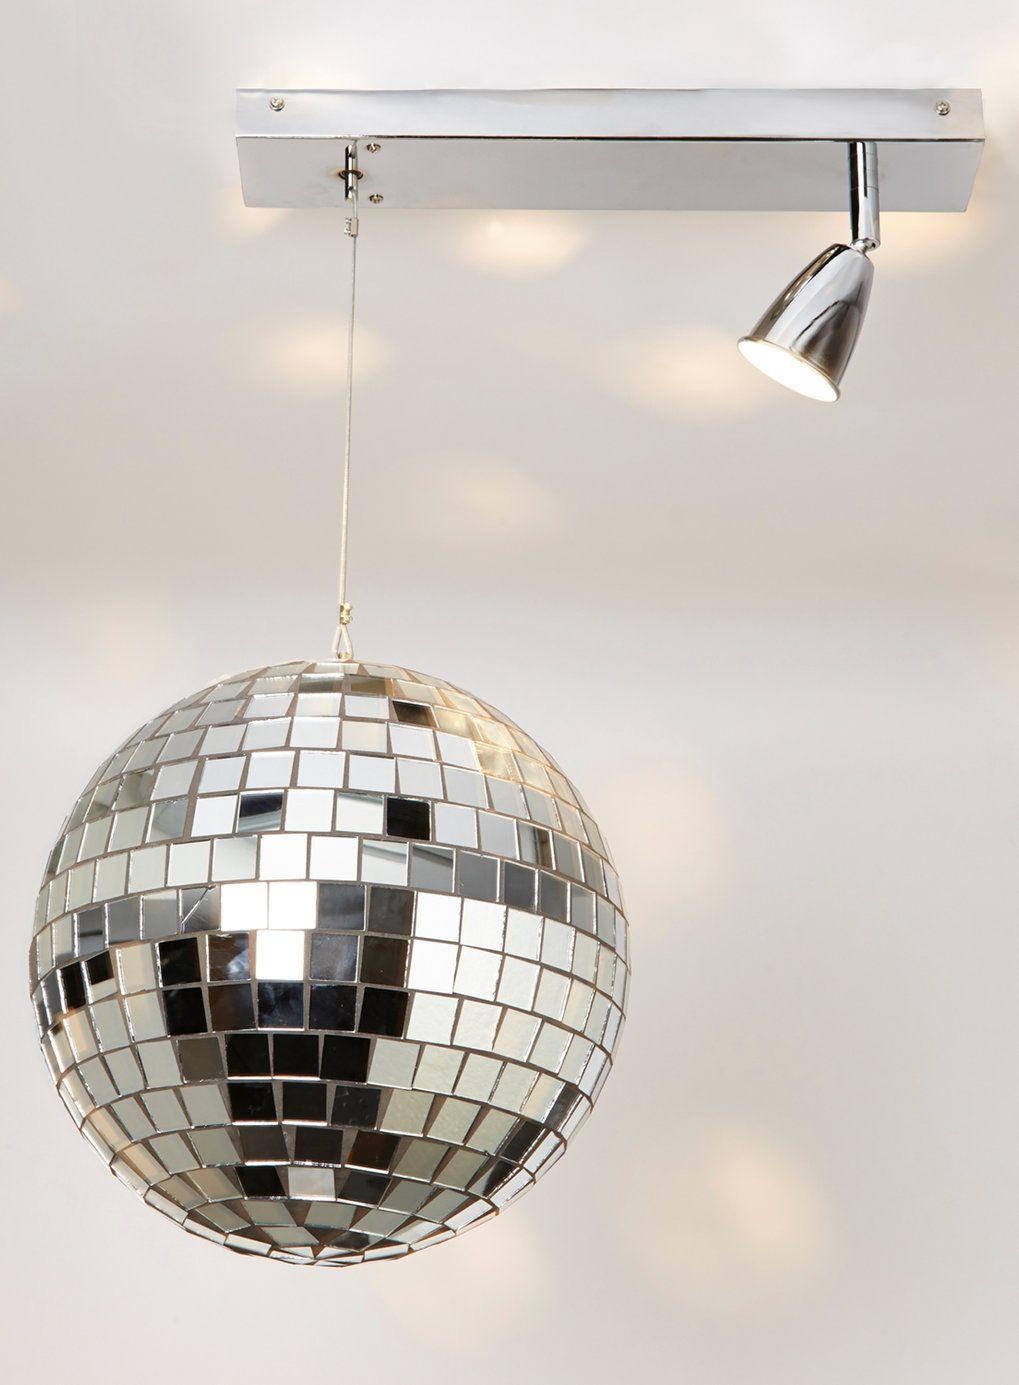 Chrome frankie disco ball bhs morgan bedroom pinterest disco chrome frankie disco ball bhs aloadofball Images